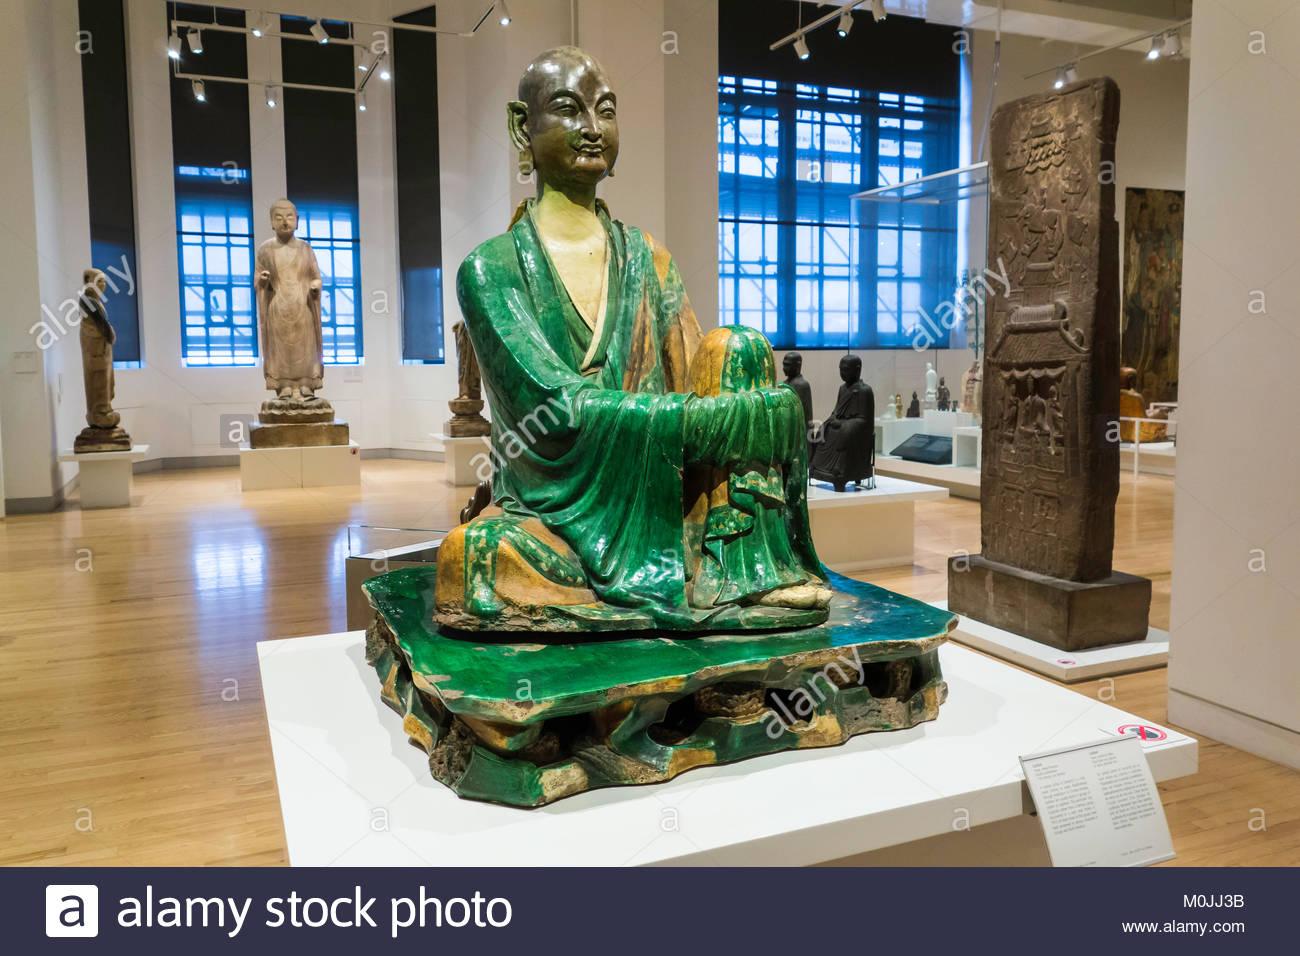 Royal Ontario Museum ROM monk or Luohan glazed earthenware clay 11 century Liao dynasty China exhibit Toronto Ontario - Stock Image